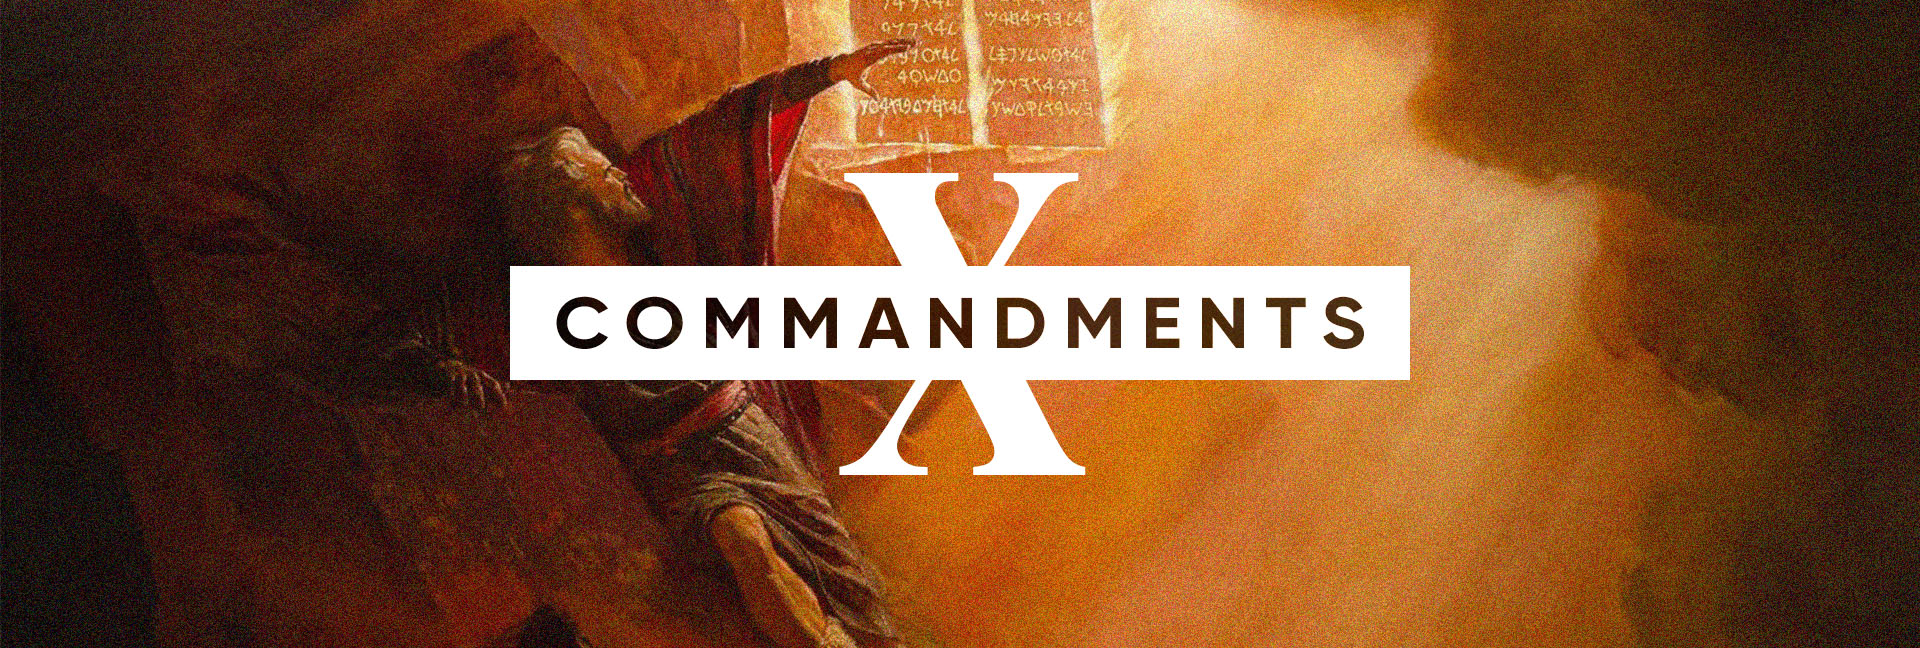 TEN COMMANDMENTS_WEB SLIDE.jpg